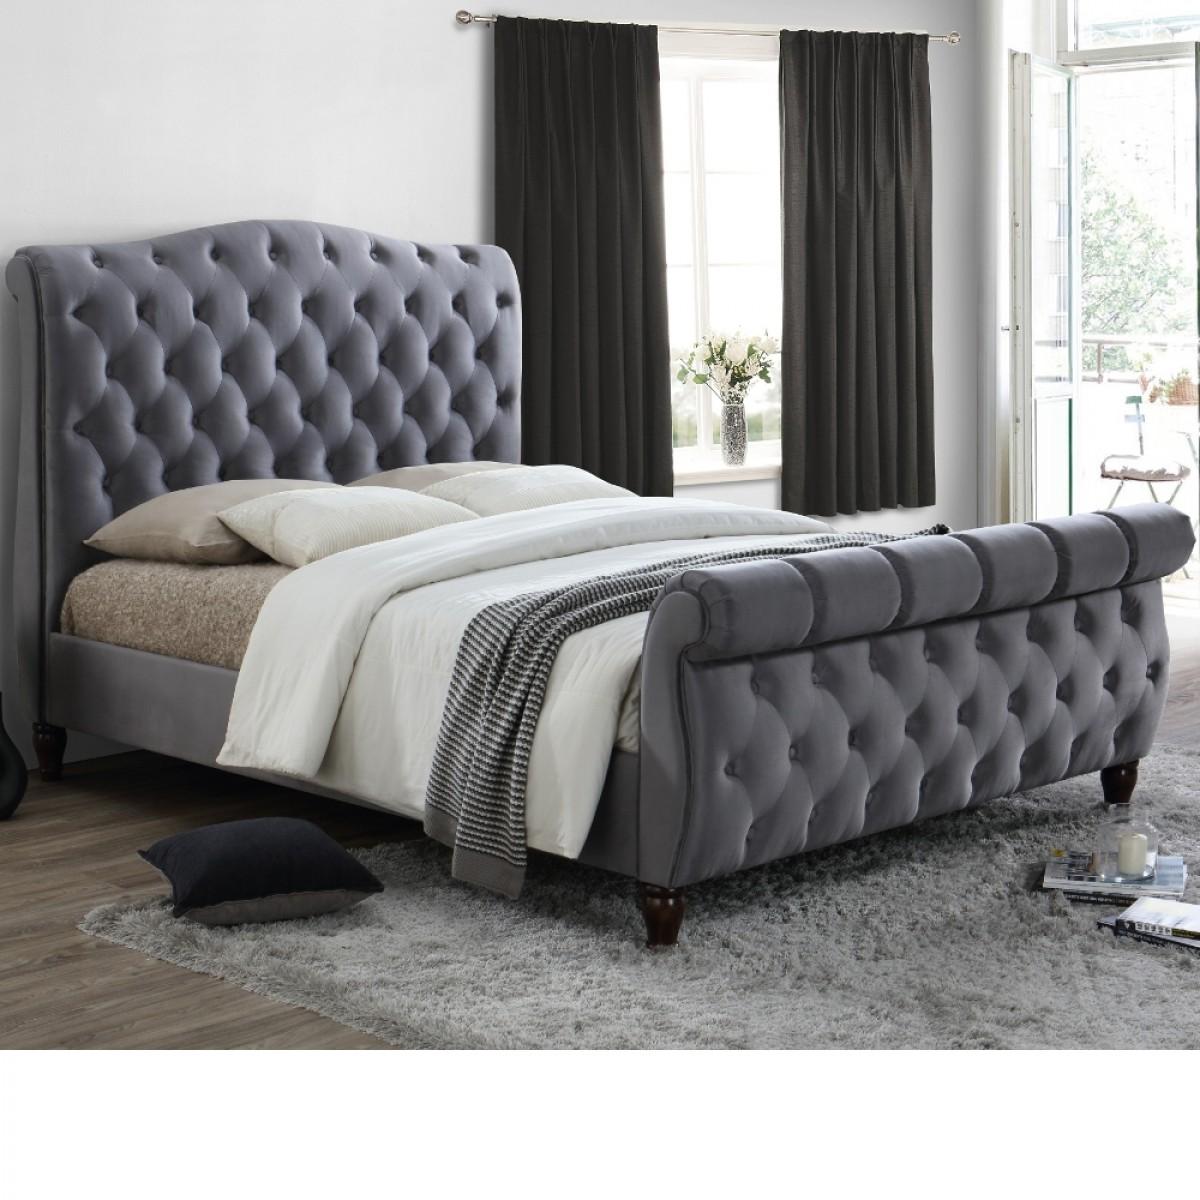 upholstered sleigh beds. Upholstered Sleigh Beds